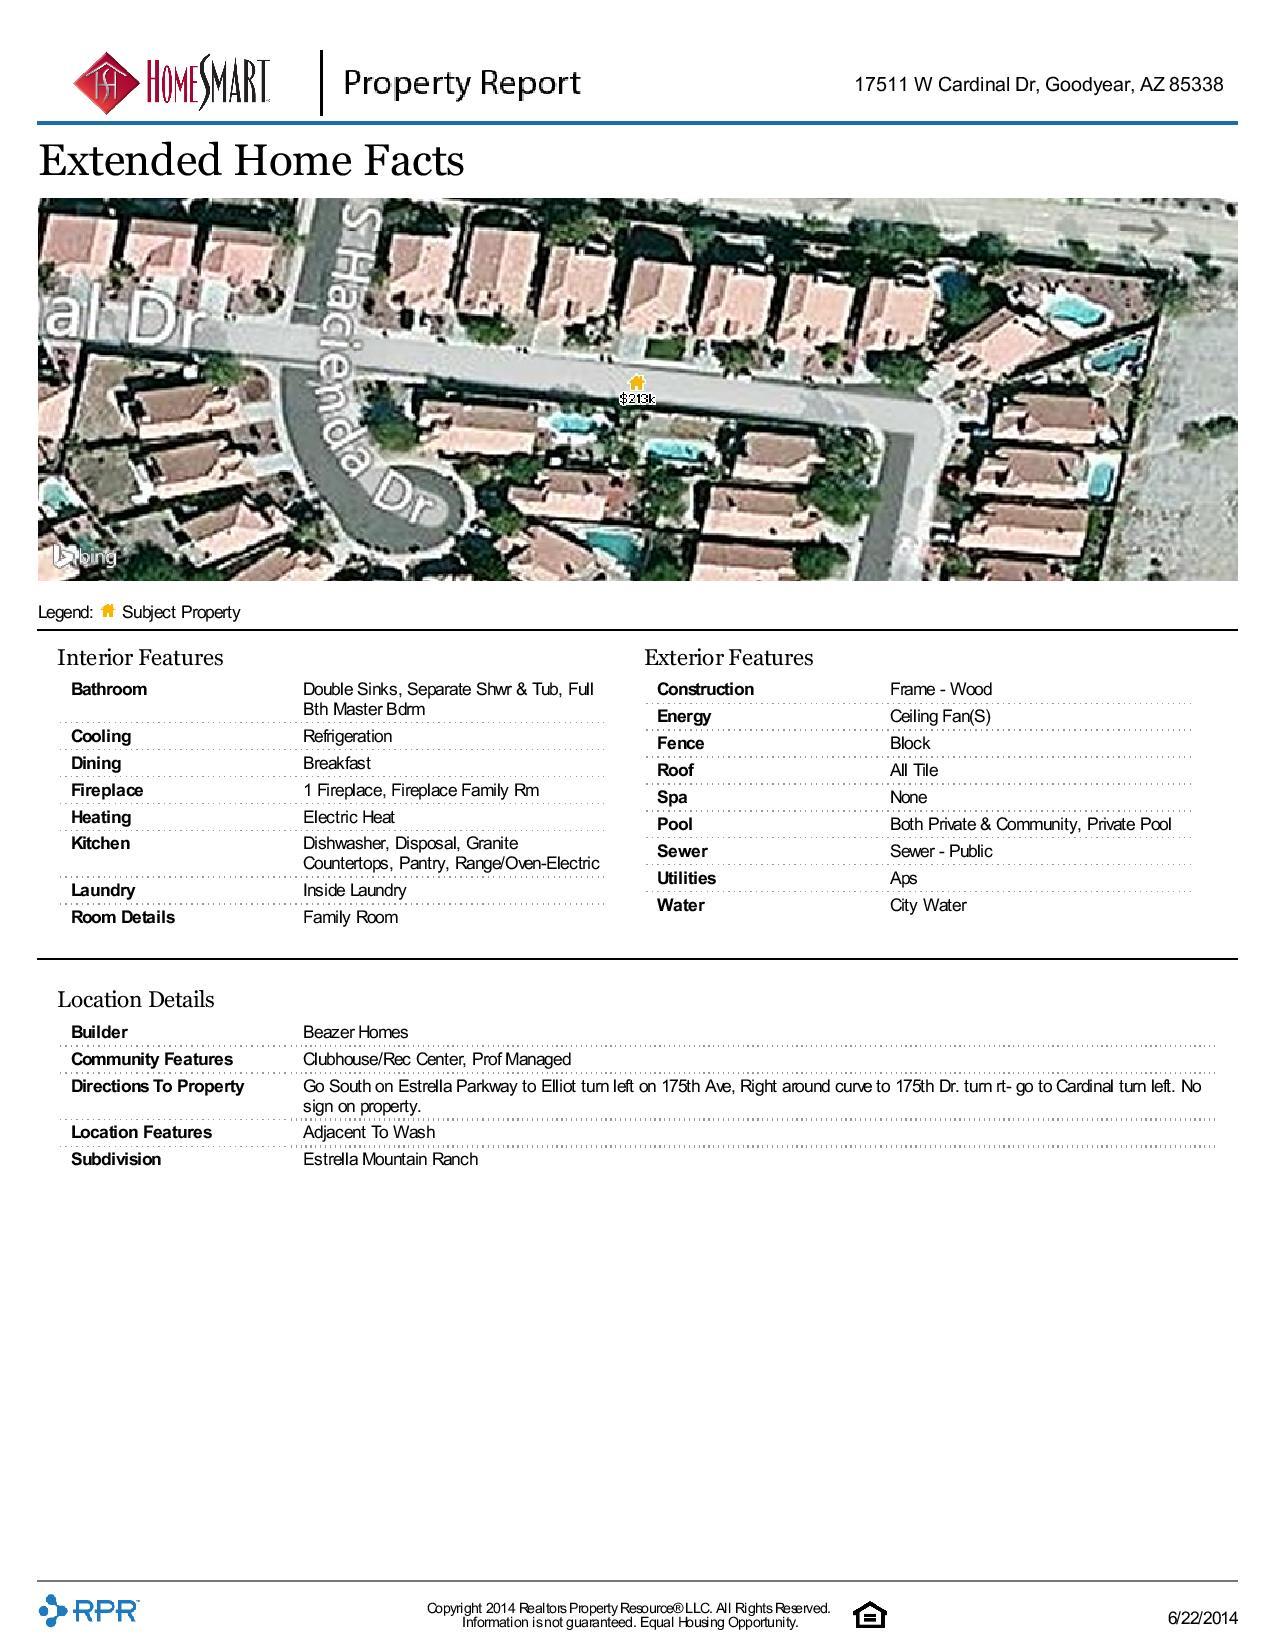 17511-W-Cardinal-Dr-Goodyear-AZ-85338-page-004